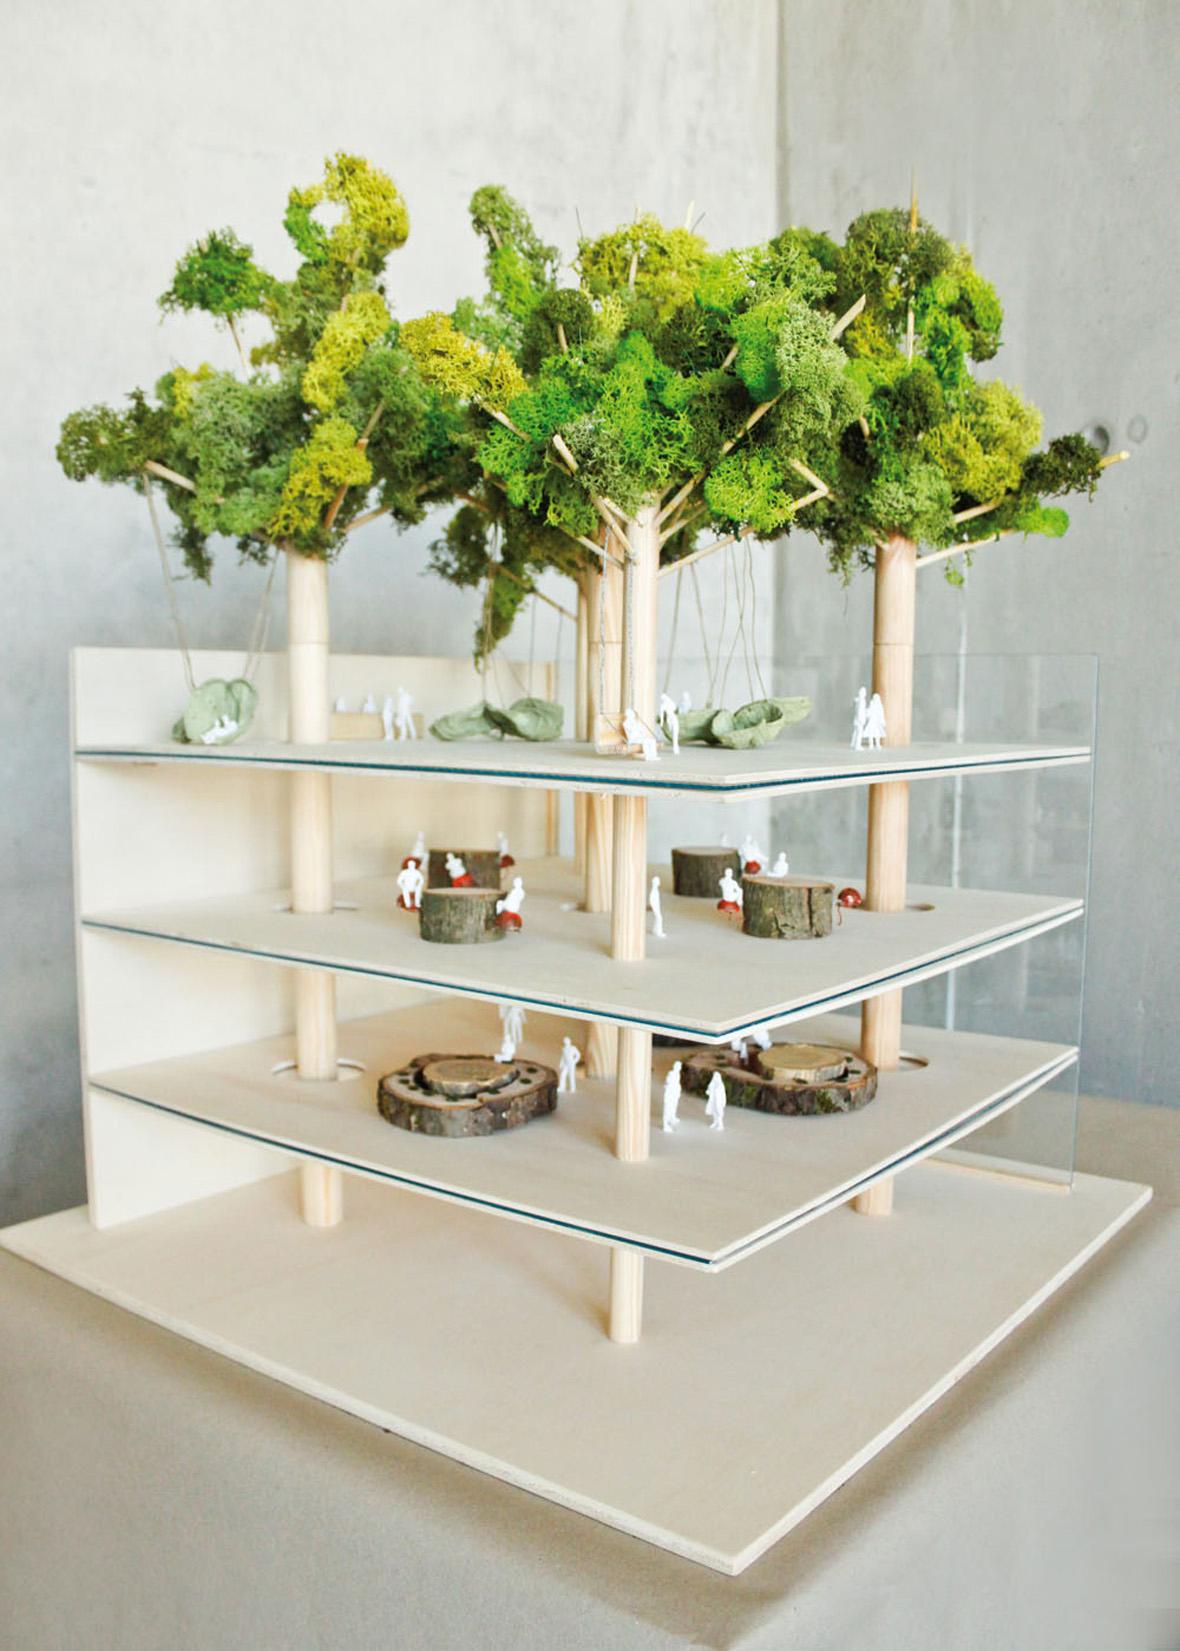 den wald vor lauter h usern nicht. Black Bedroom Furniture Sets. Home Design Ideas